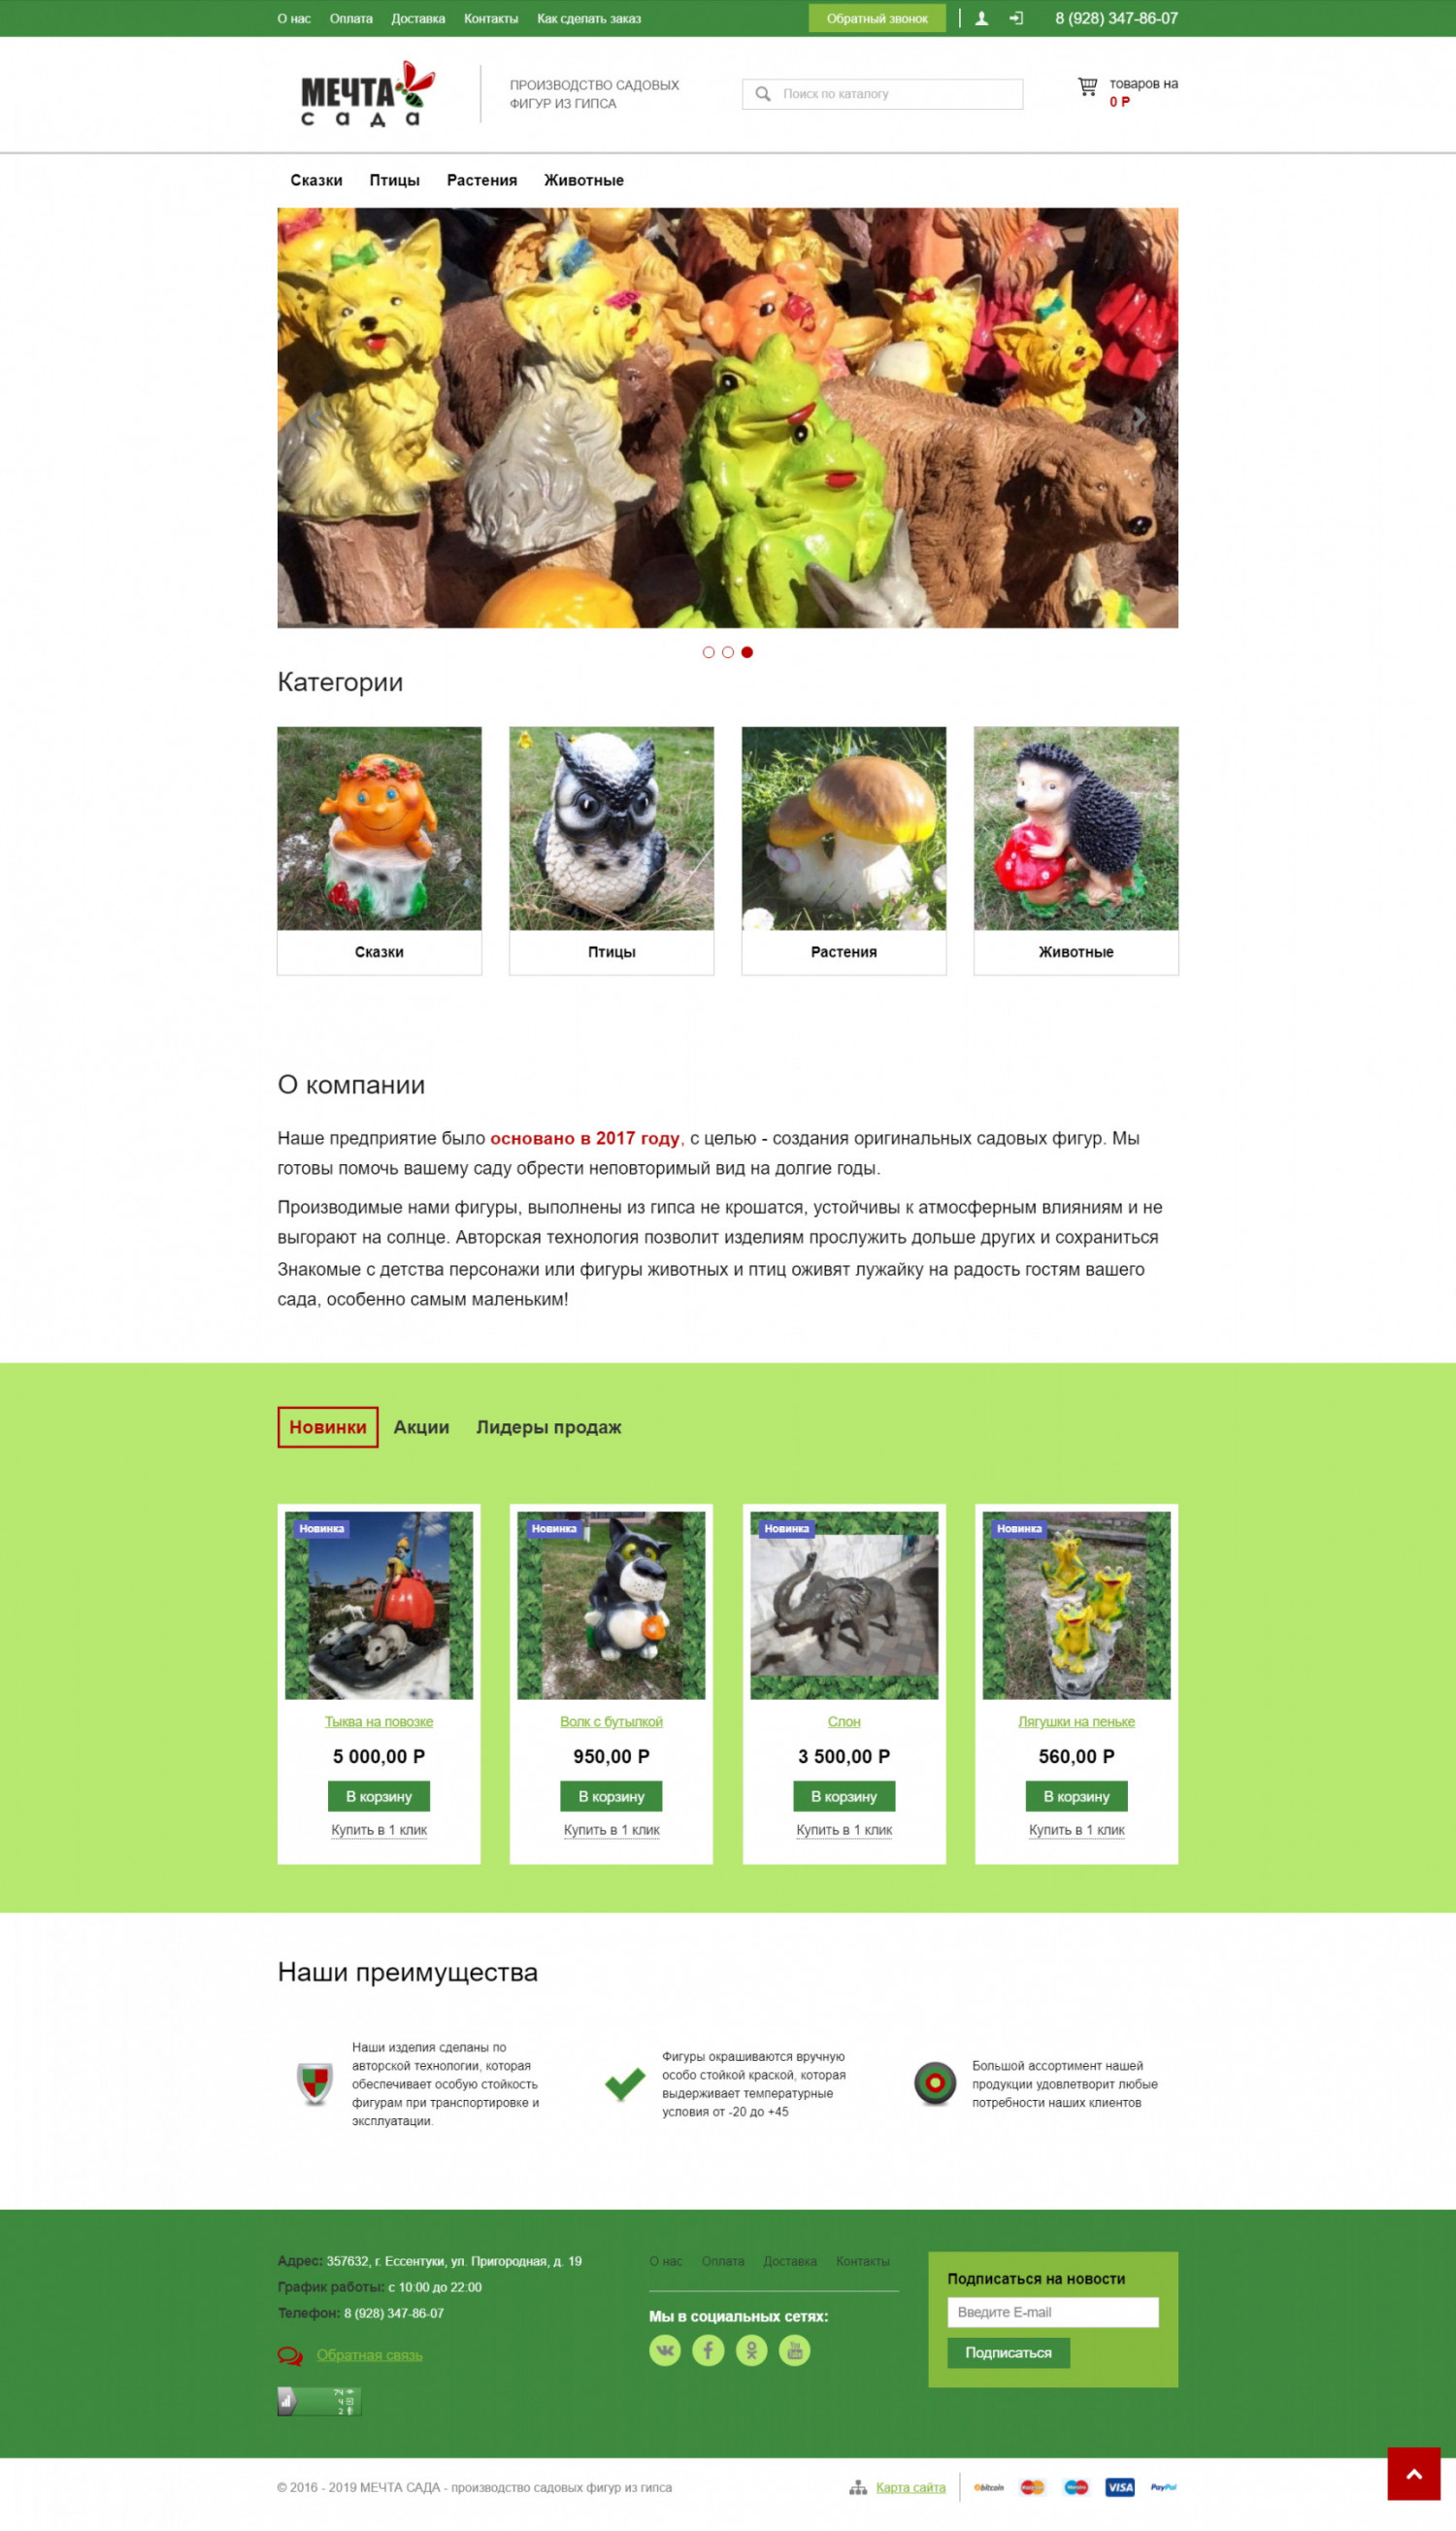 сайт интернет-магазина садовых фигур